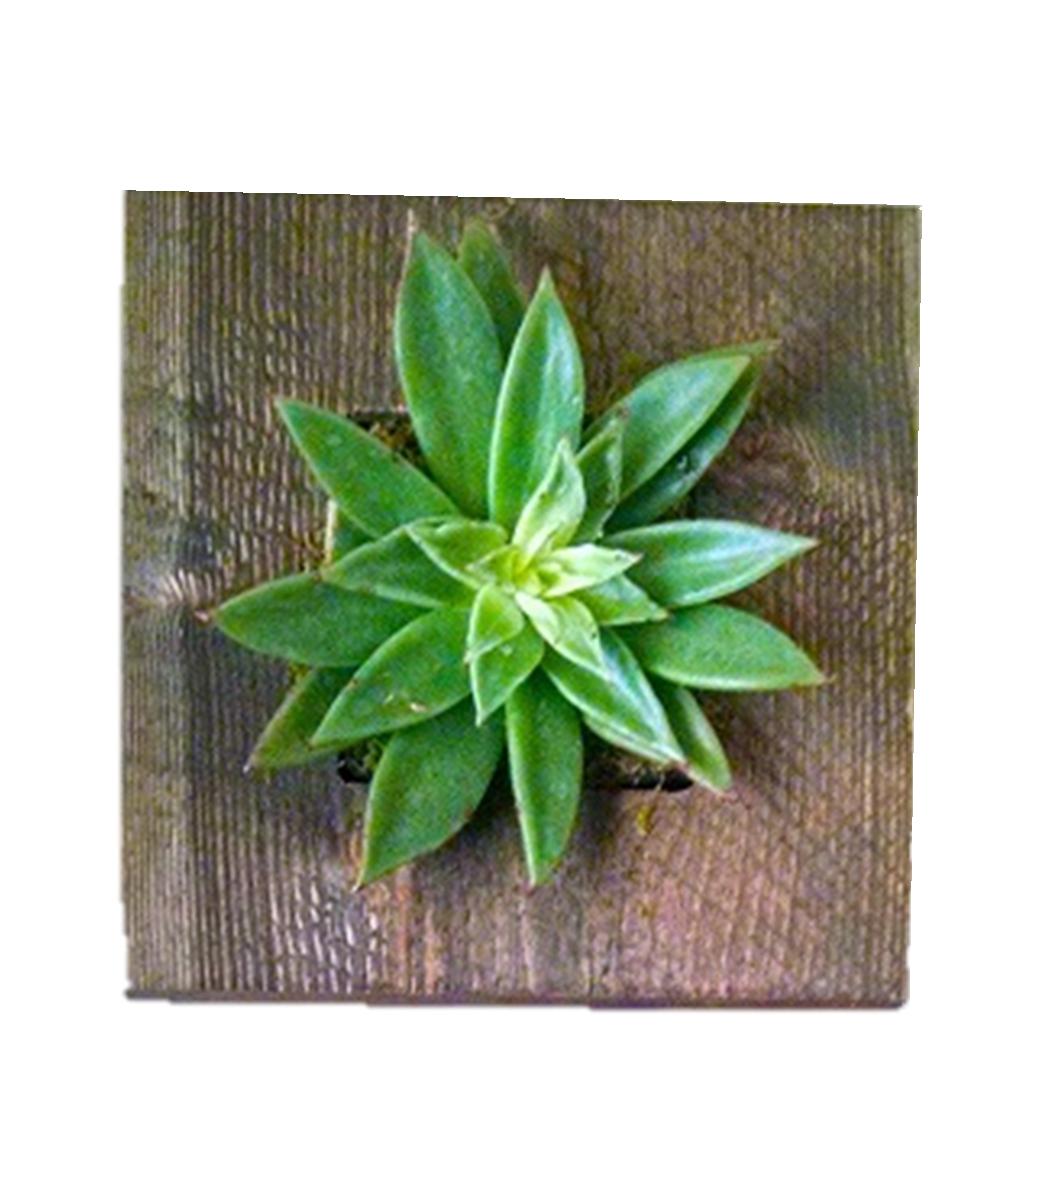 Unique planters make great gift ideas